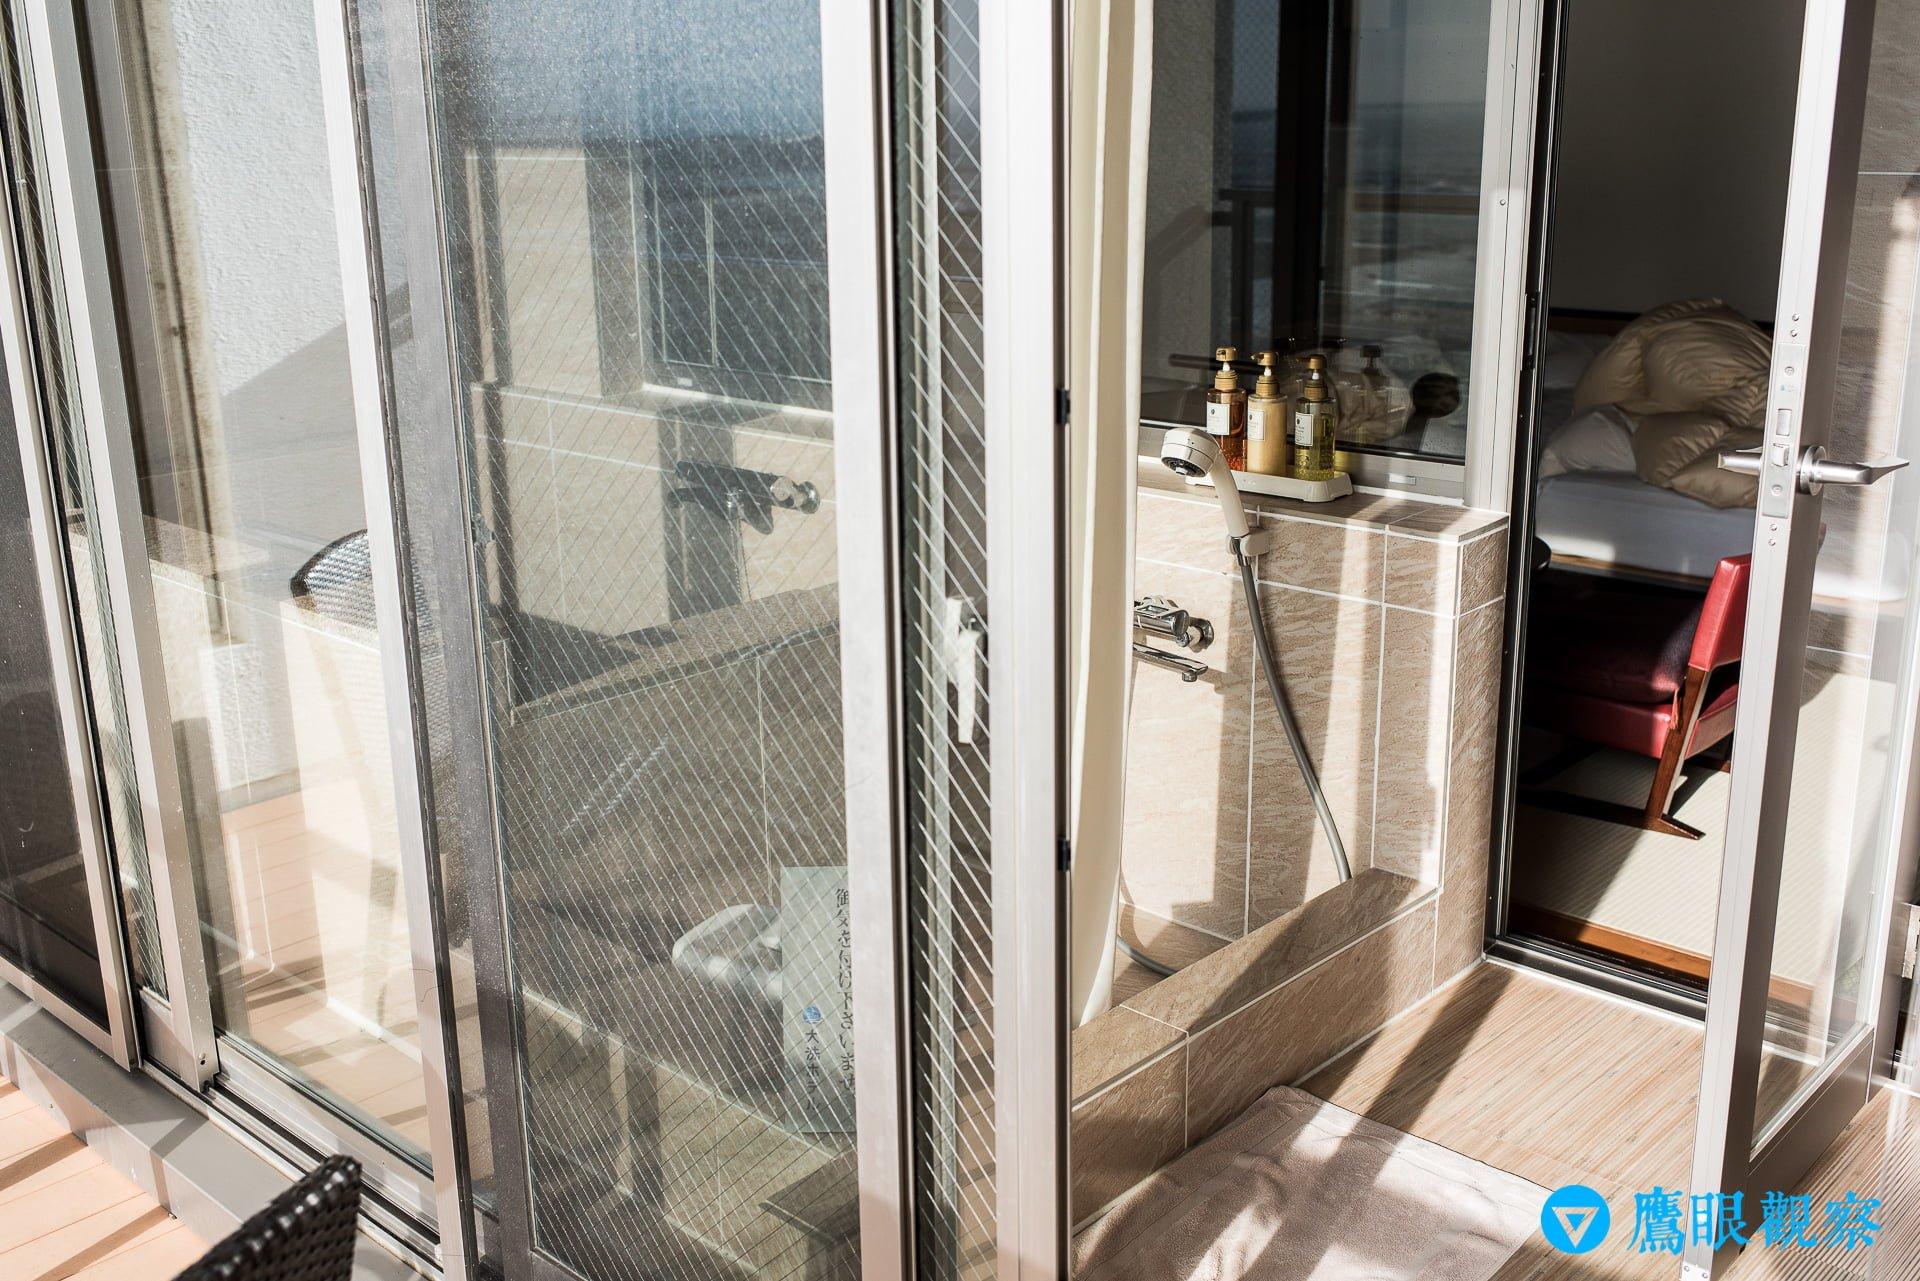 Travel Oarai Hotel in Ibaraki Prefecture Japan 88 日本茨城縣/東茨城/大洗飯店(大洗ホテル)/旅館推薦與住宿旅遊心得分享